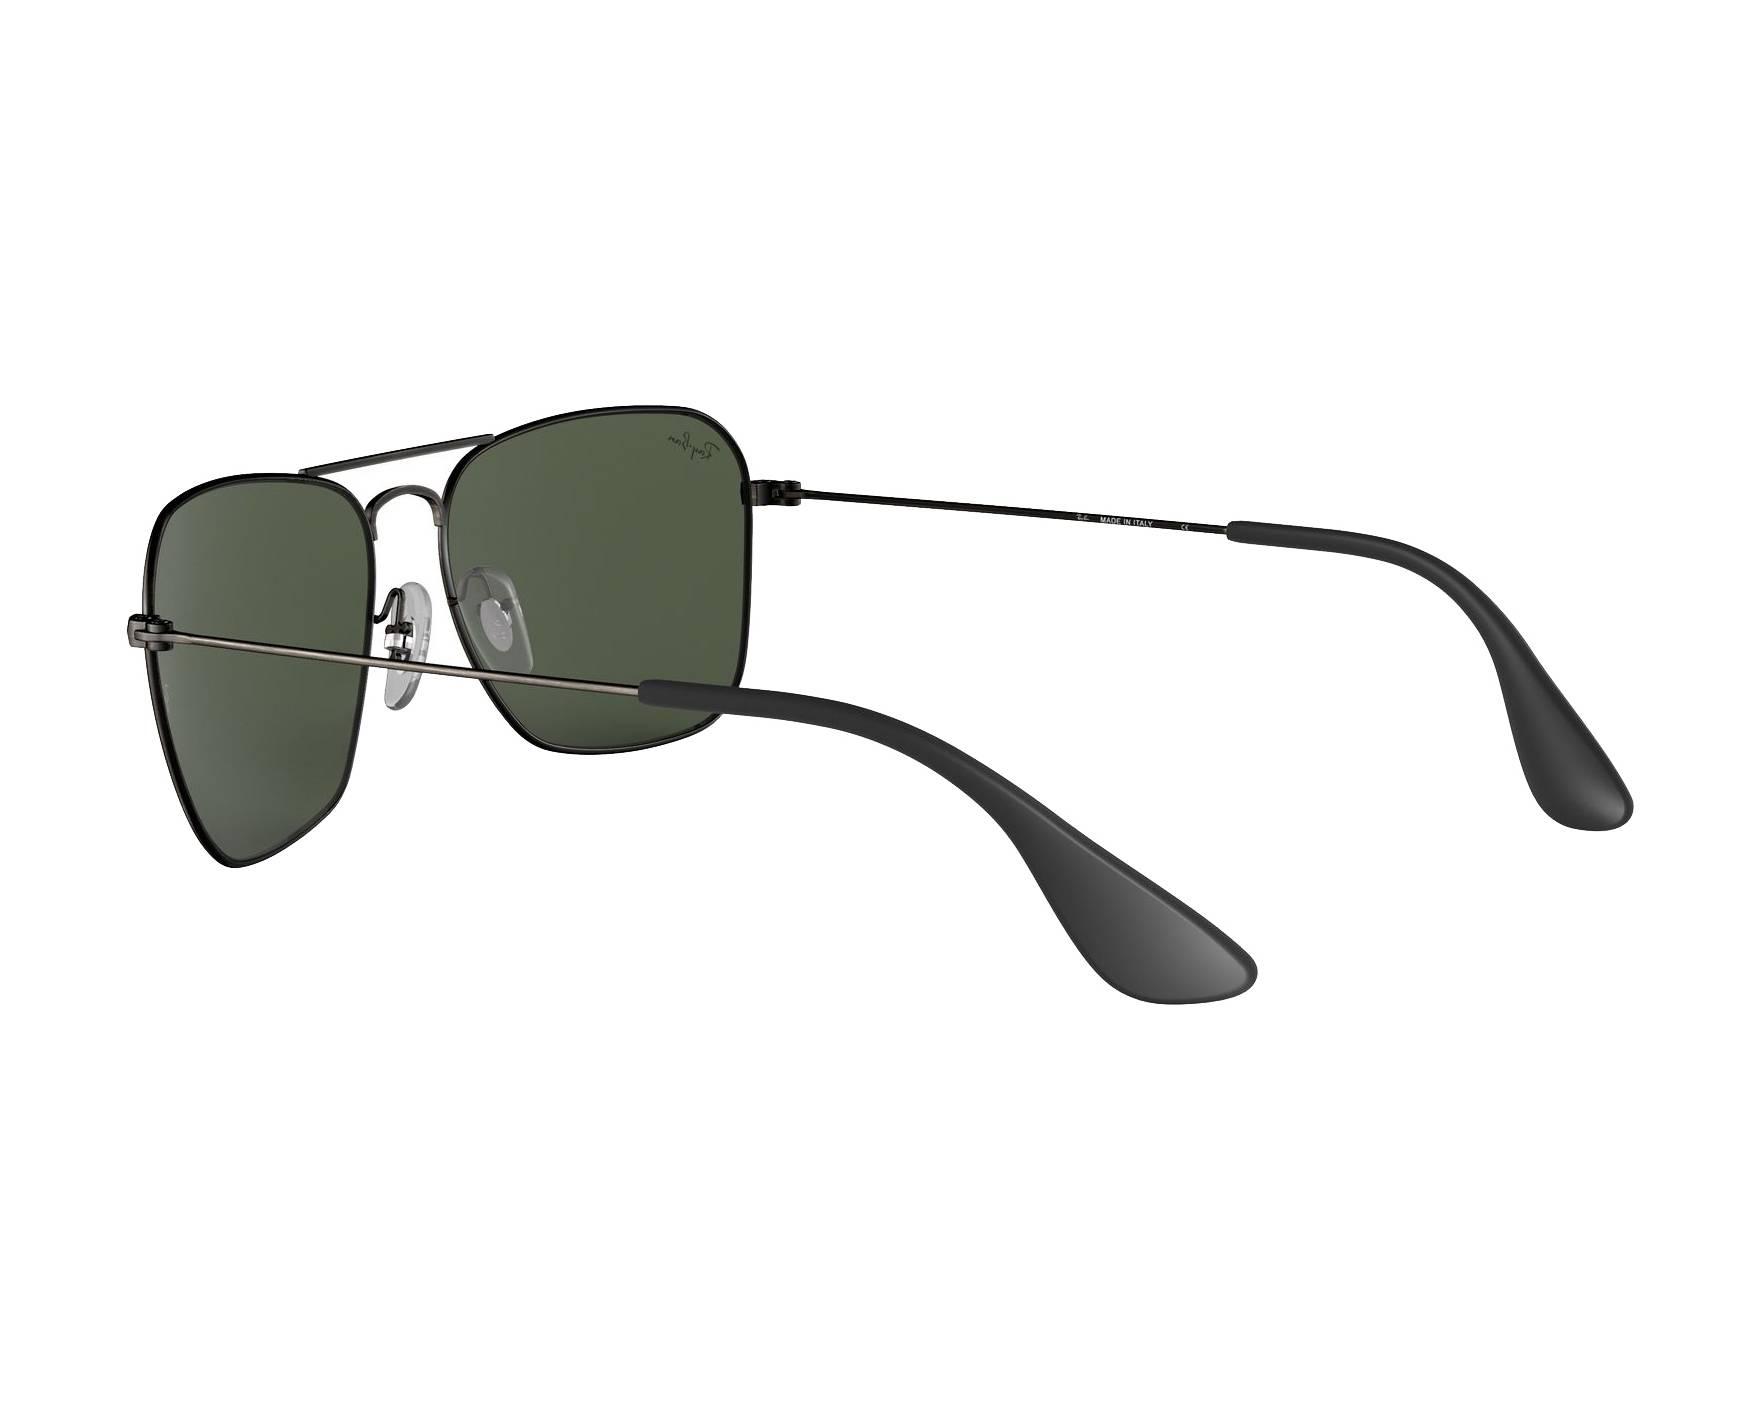 88ab3736686 Sunglasses Ray-Ban RB-3610 913971 58-15 Gun 360 degree view 5